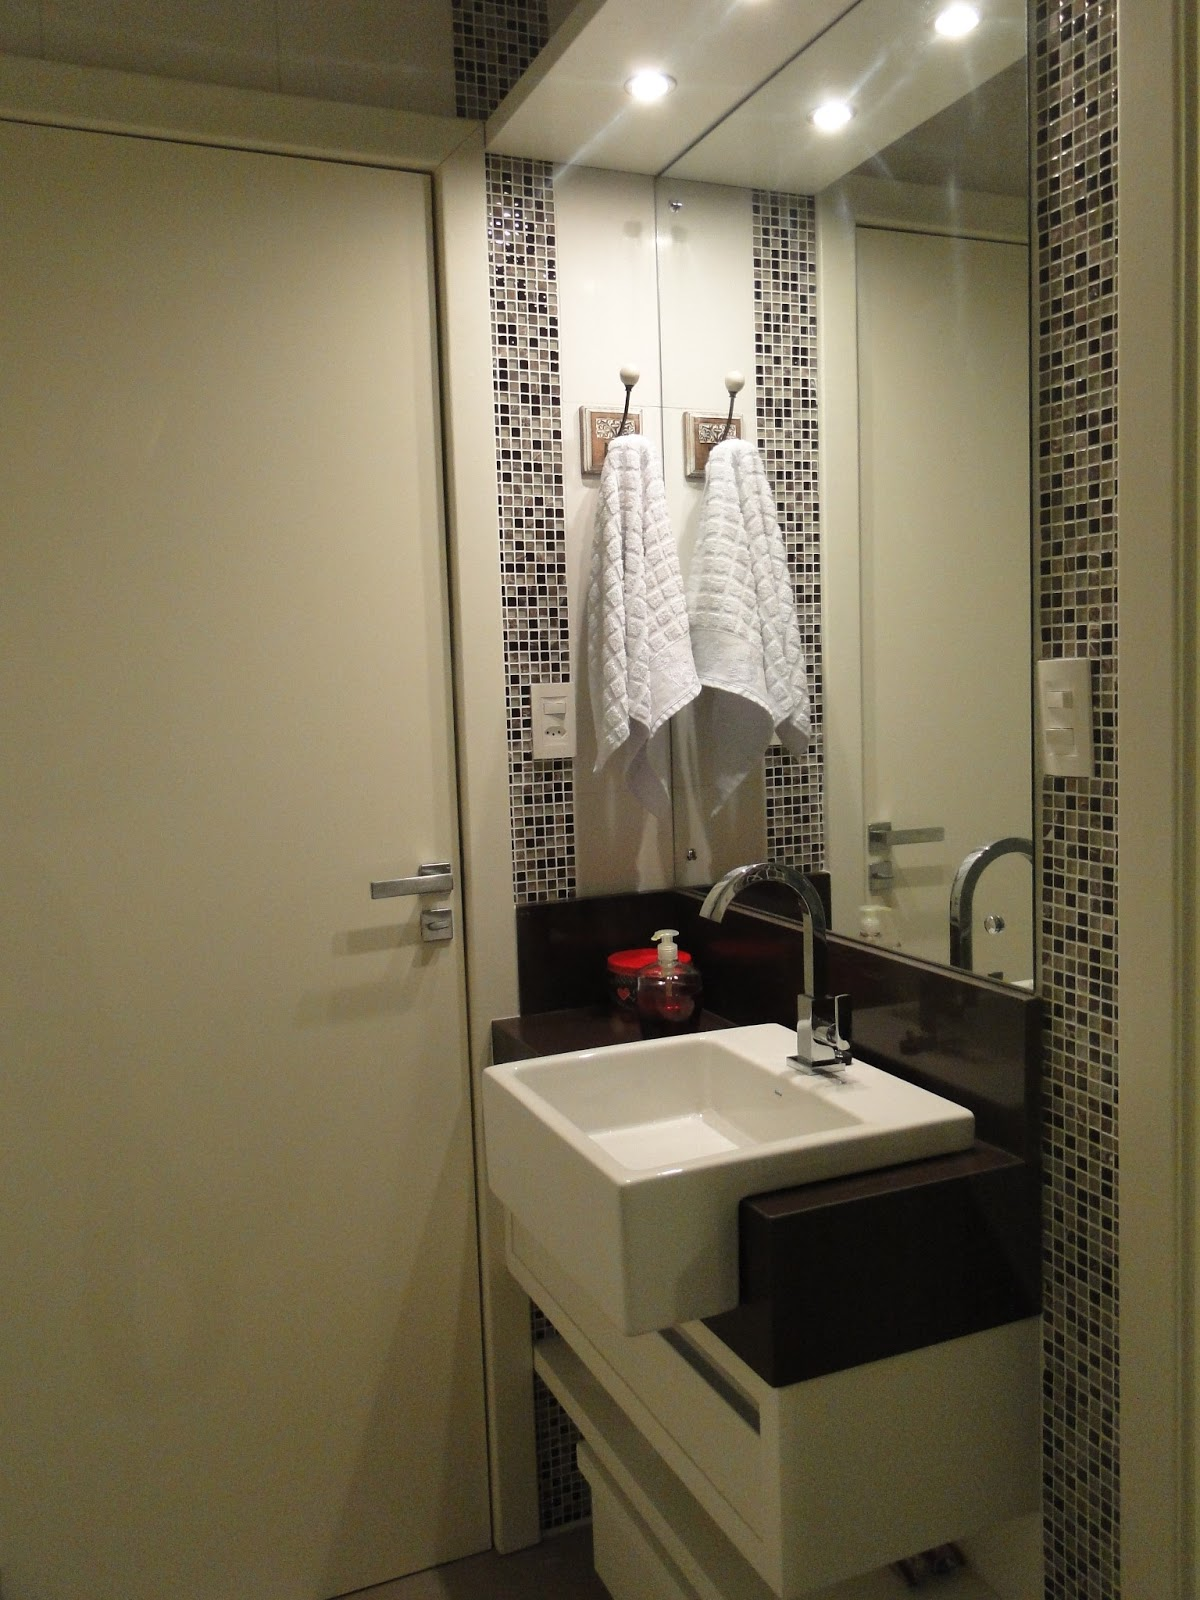 embase arquitetura para projetos de vida: Clínica de fisioterapia  #B71418 1200x1600 Banheiro Branco E Marron